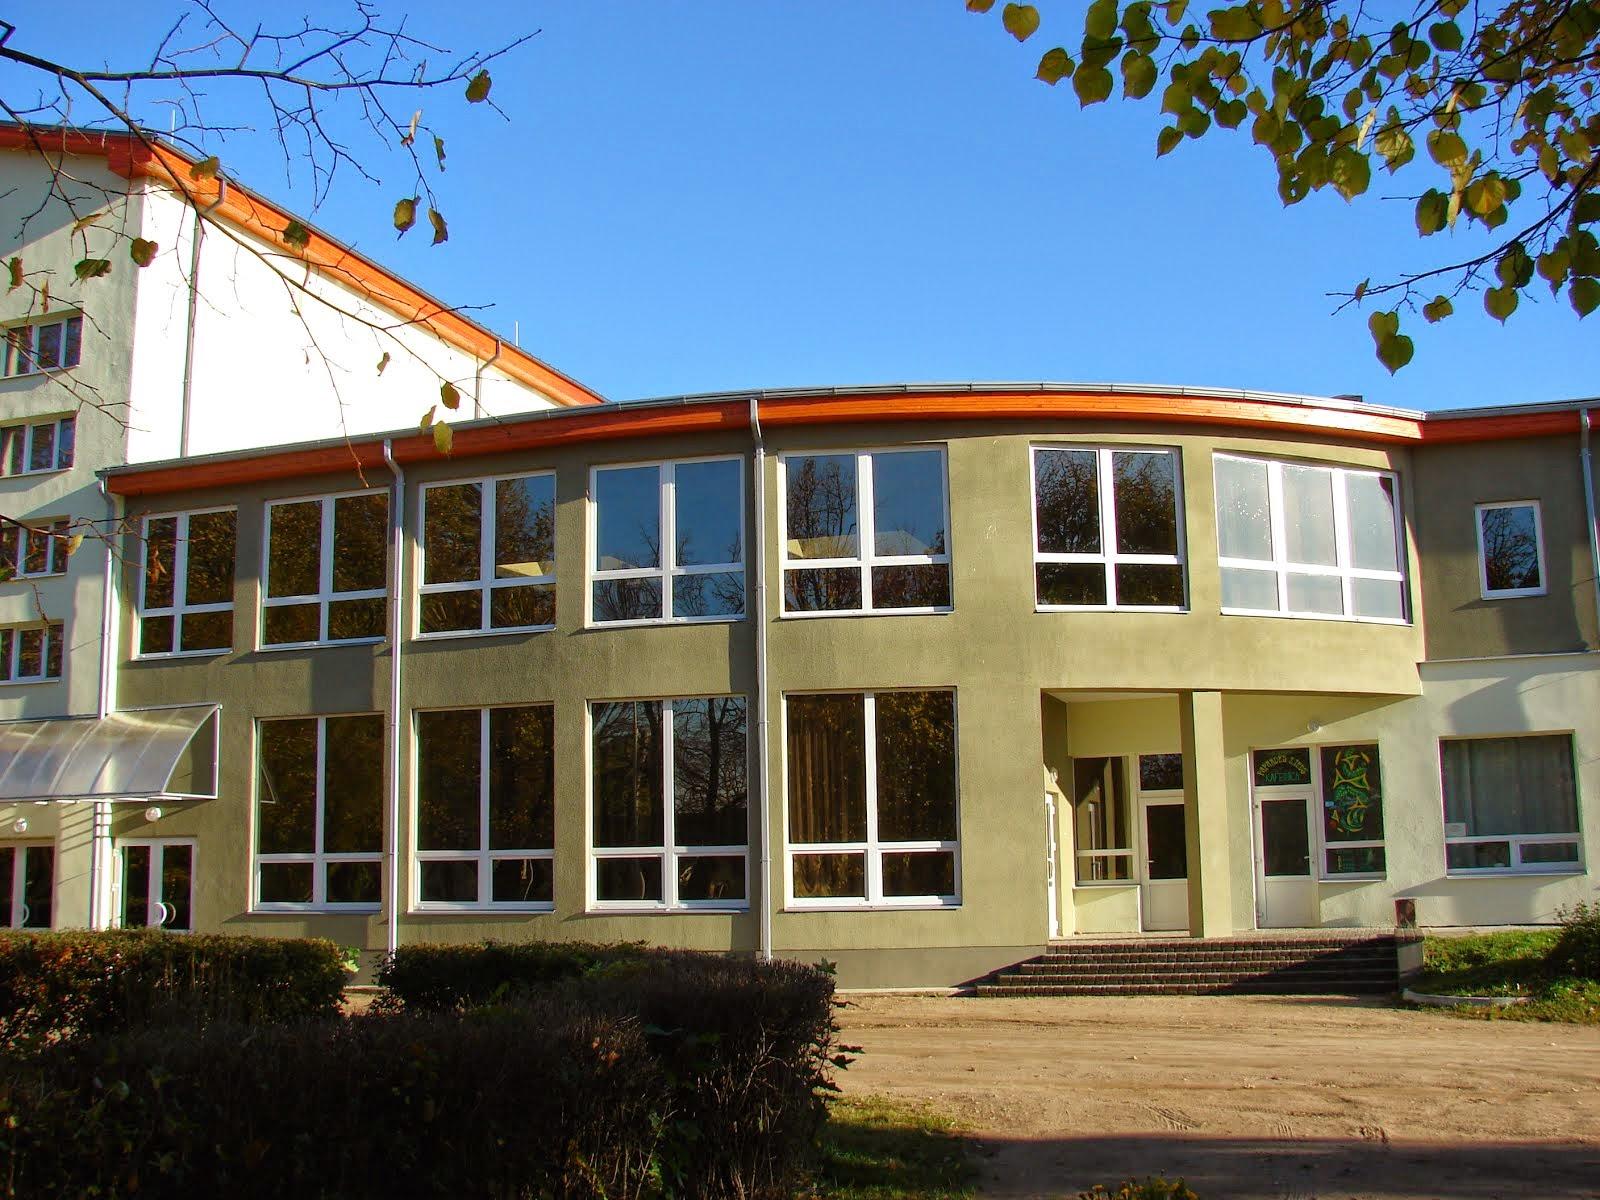 Dagdas novada tautas bibliotēka